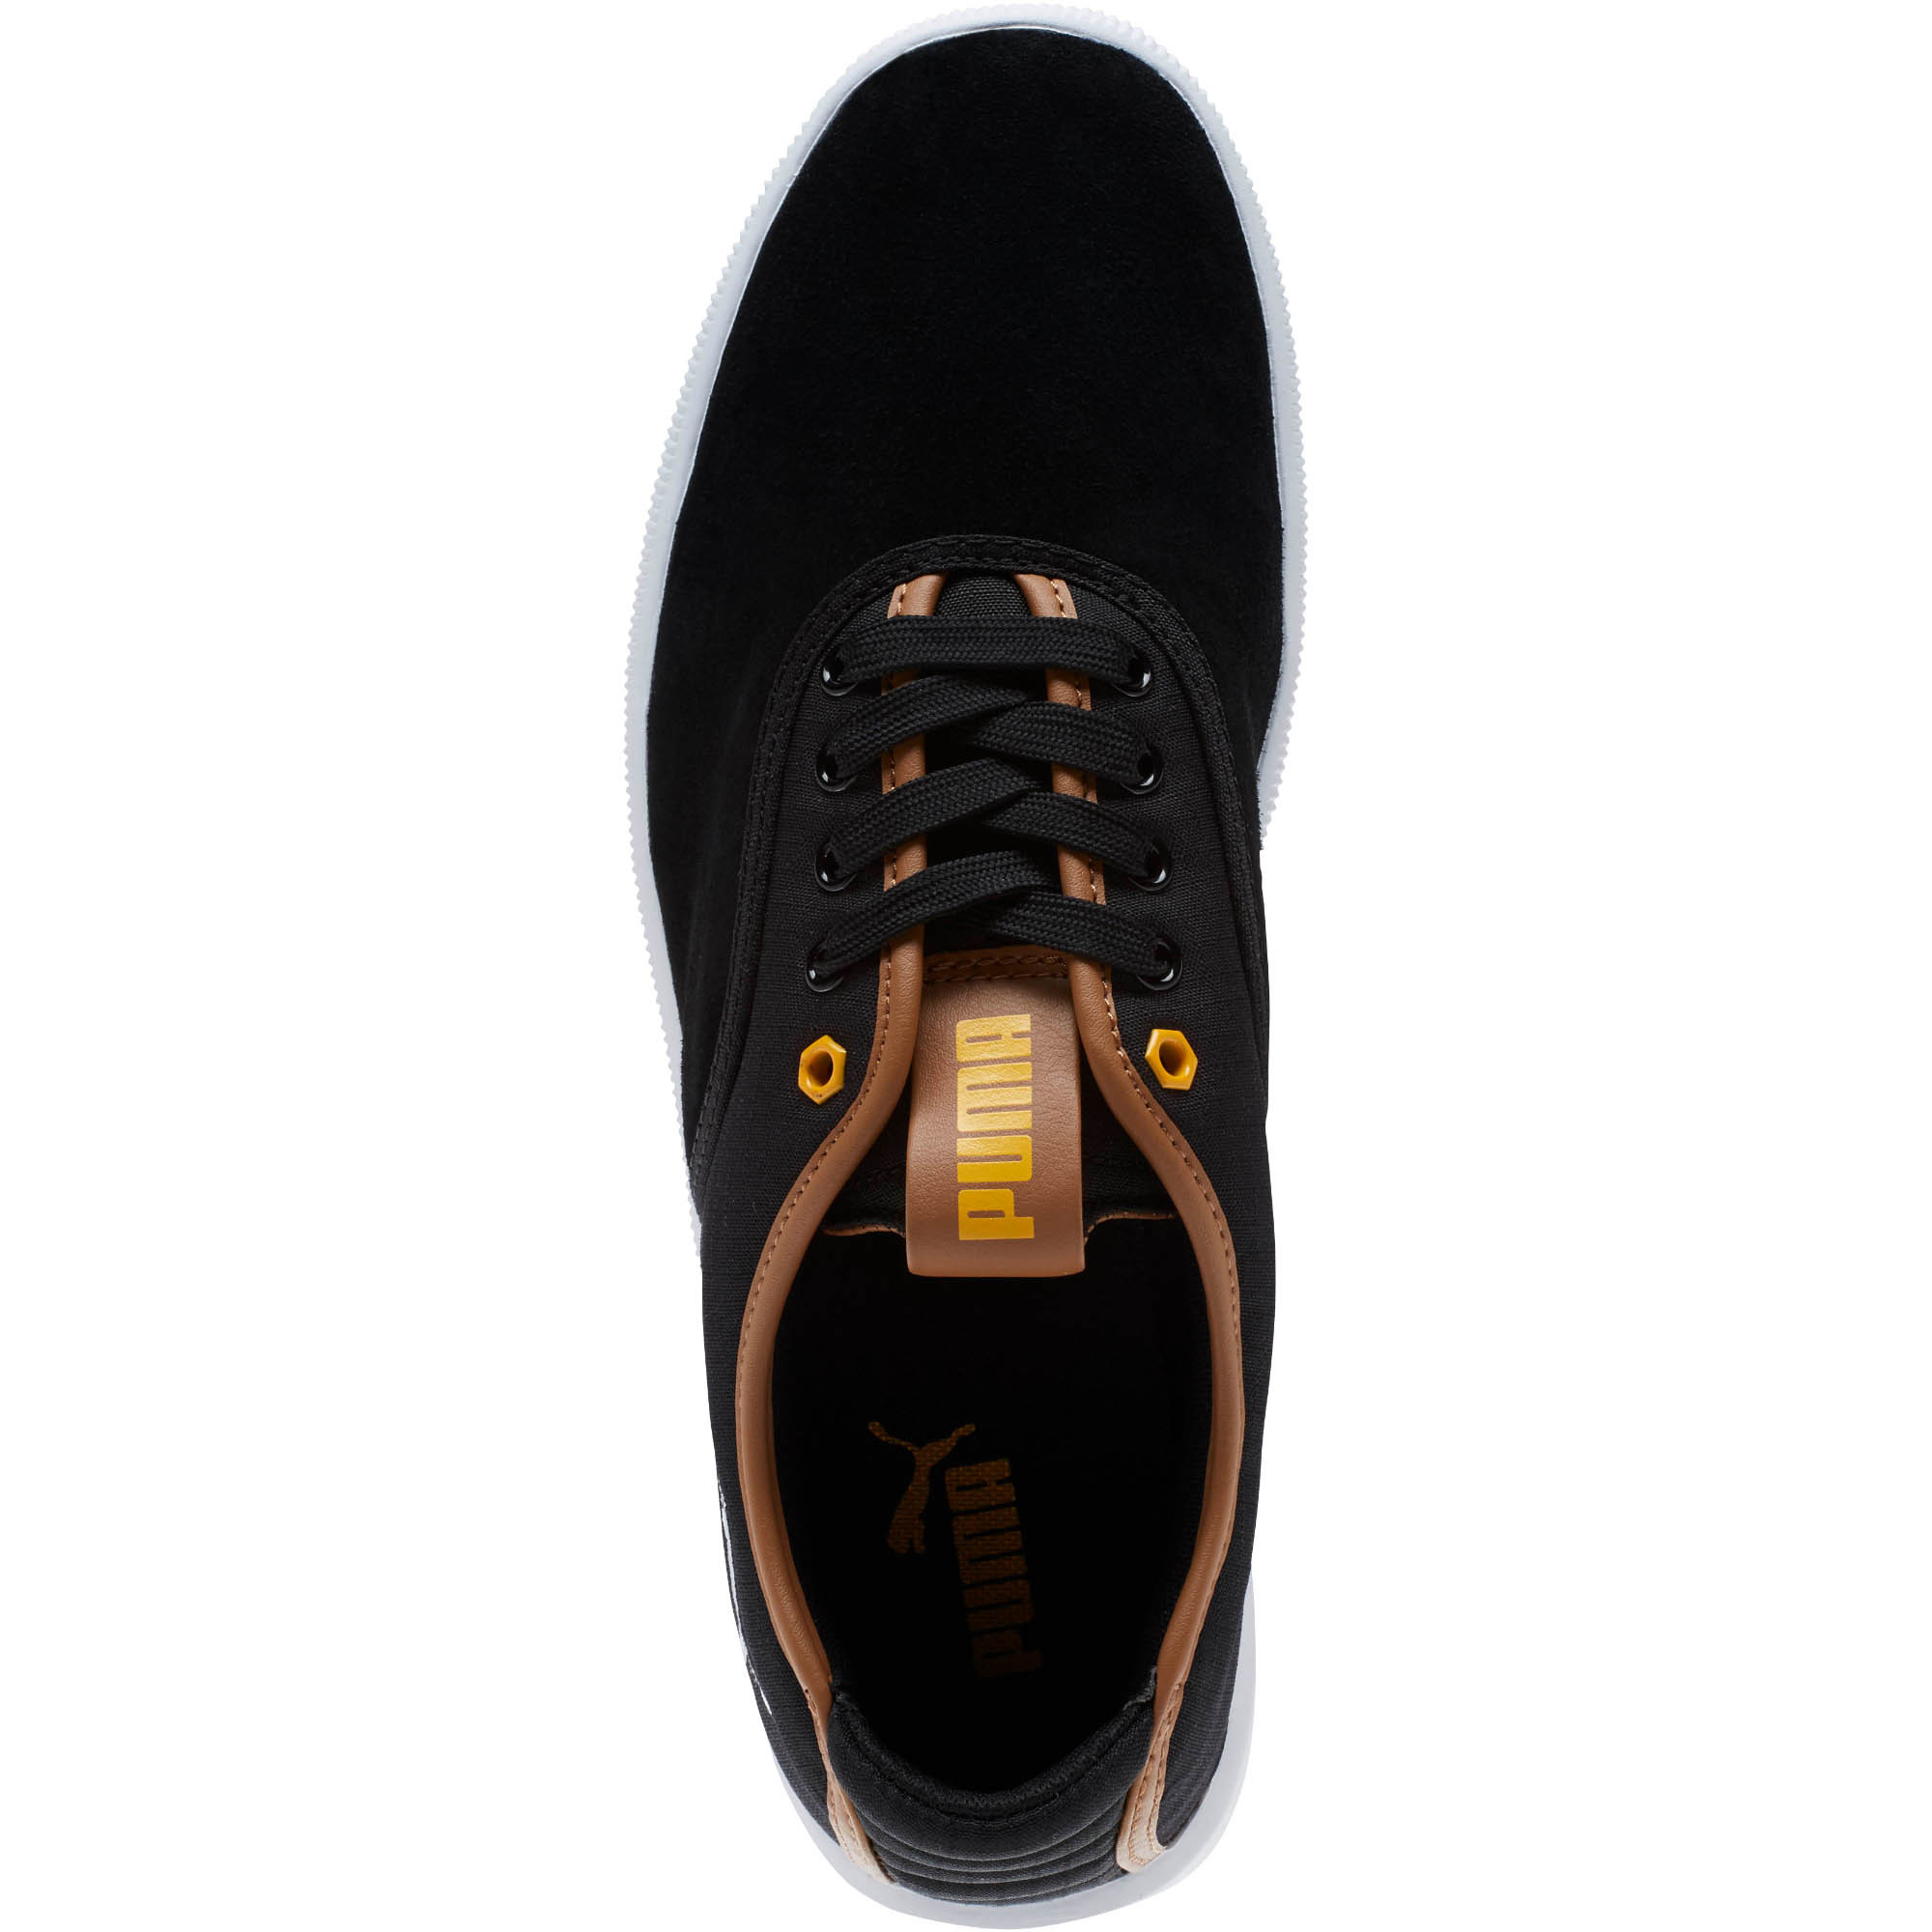 PUMA-Funist-Lo-MU-Men-039-s-Sneakers-Men-Shoe-Evolution thumbnail 6